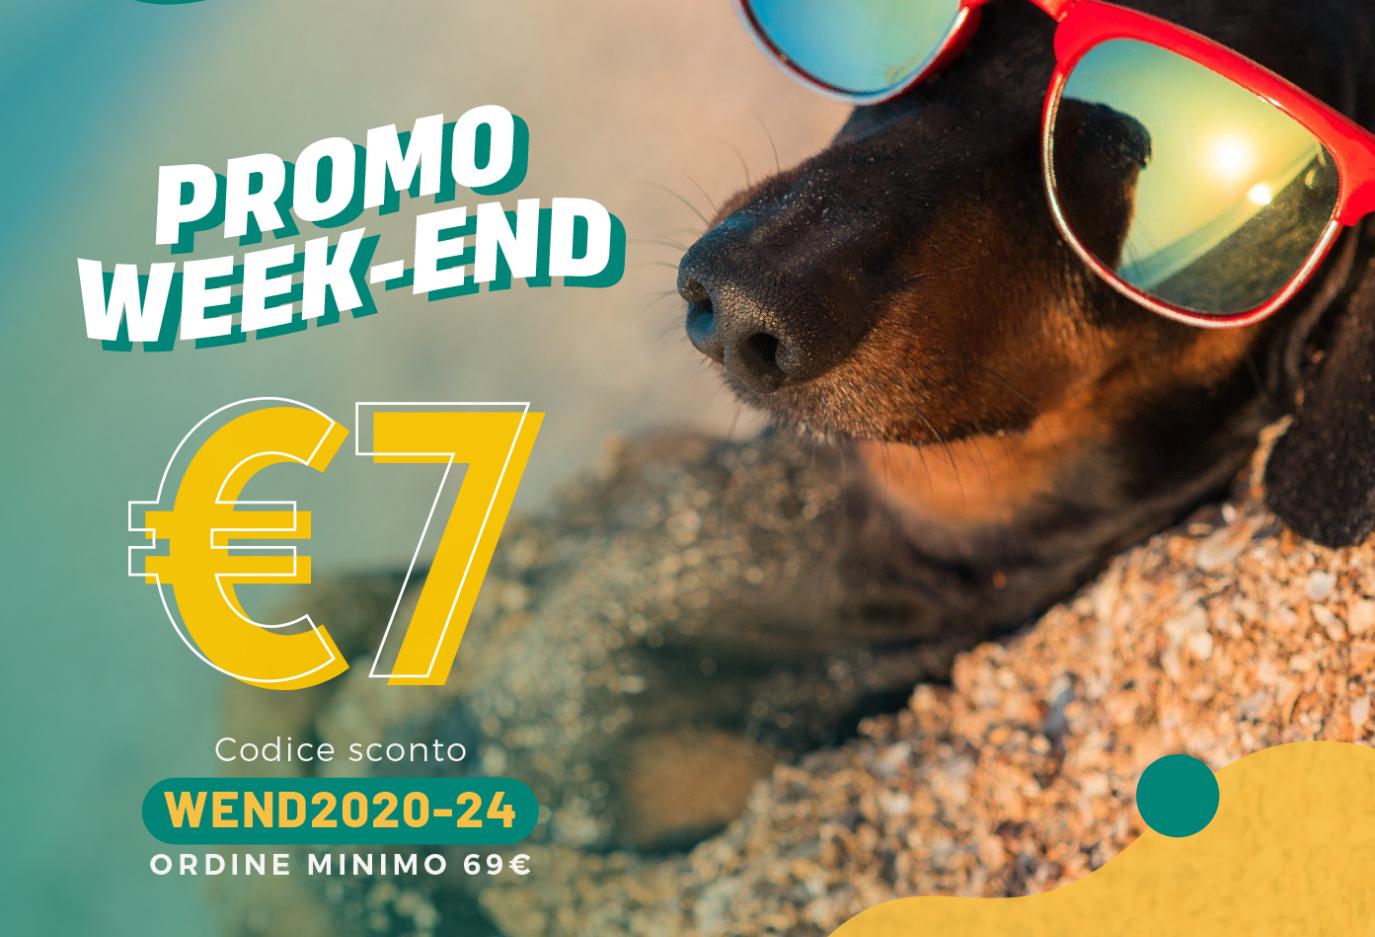 Promo Weekend SCONTO 7€ fino a Domenica 02 Agosto